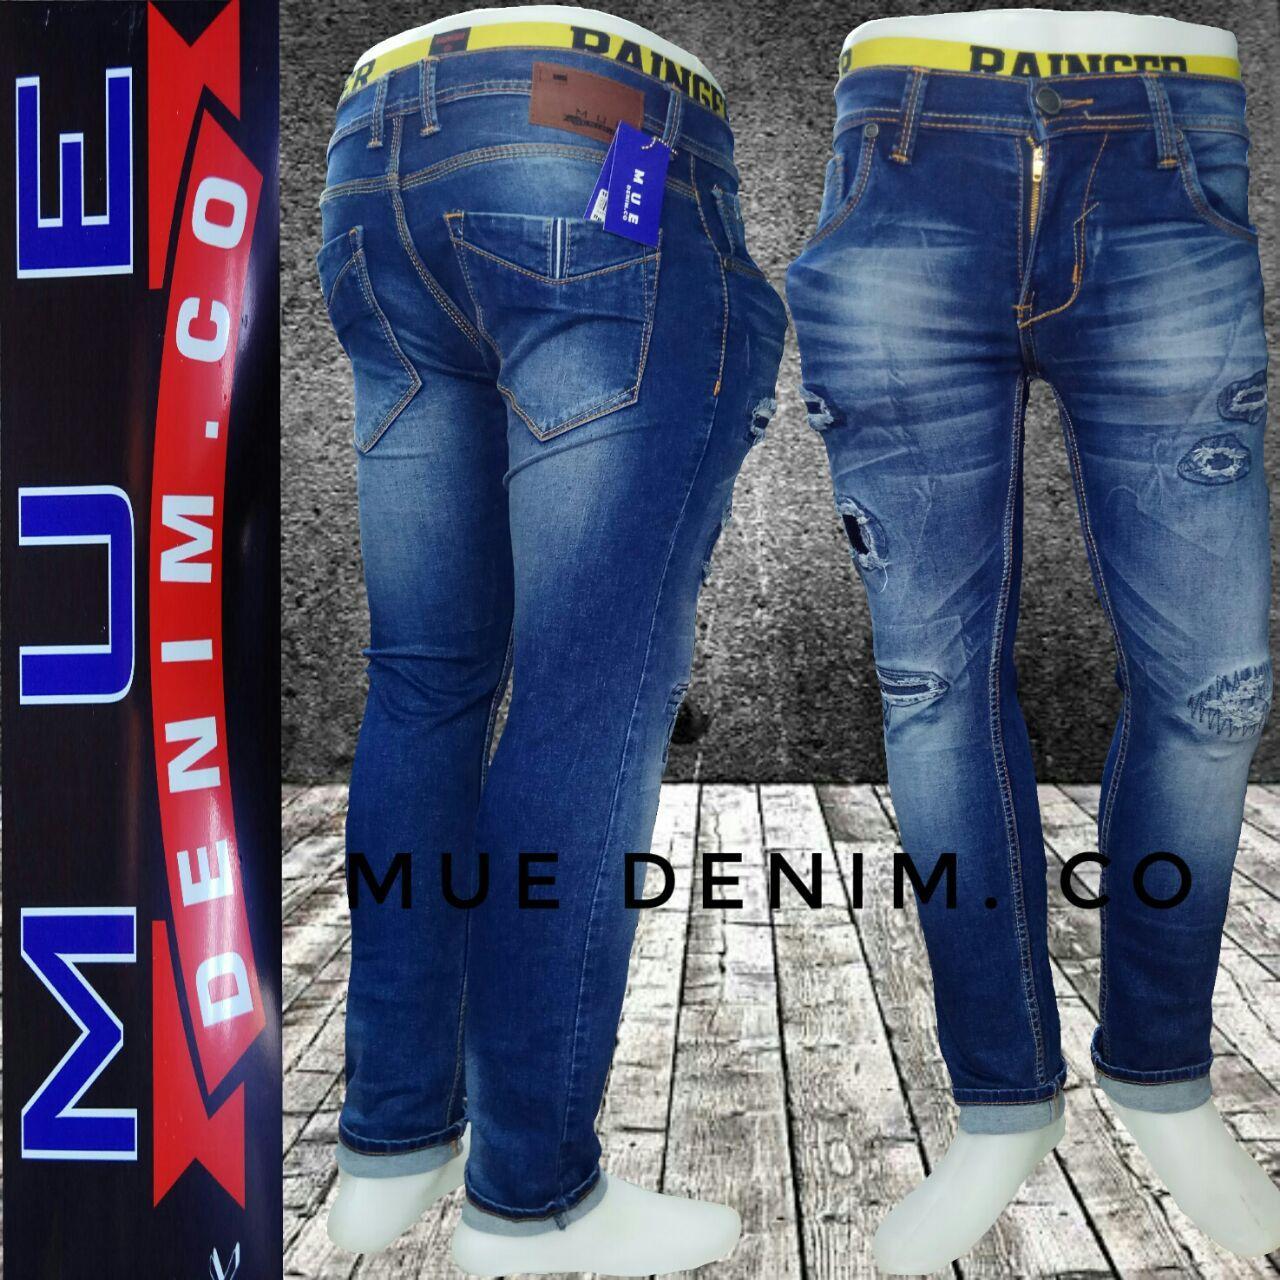 Mue Denimco Celana Panjang Pria Model Sobek Bahan Soft Jeans Street Co Streets Pants Terbaru